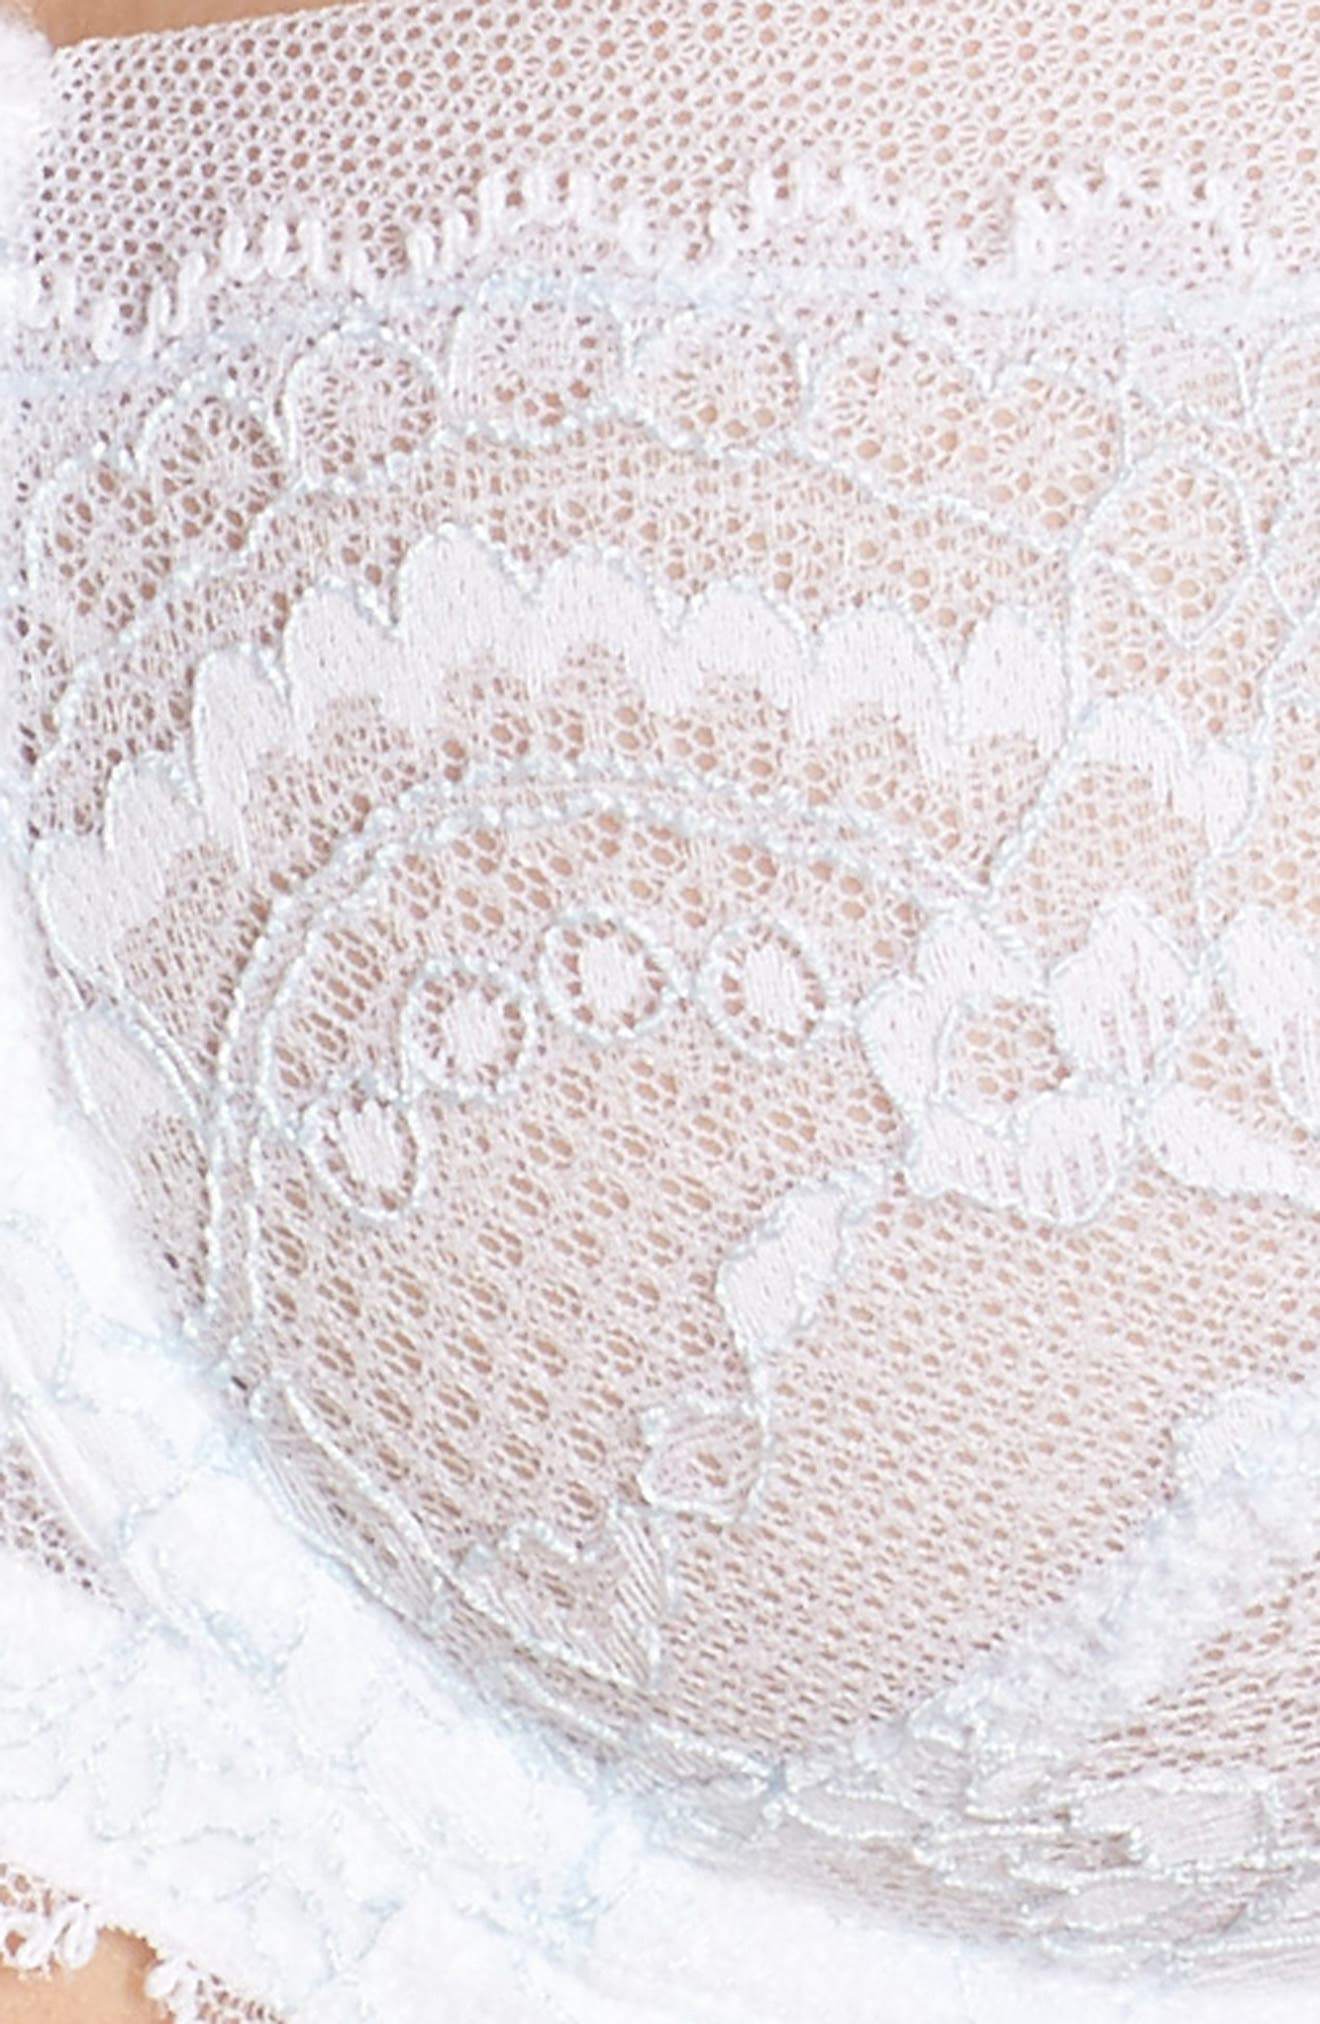 'Minx' Unlined Lace Demi Underwire Bra,                             Alternate thumbnail 76, color,